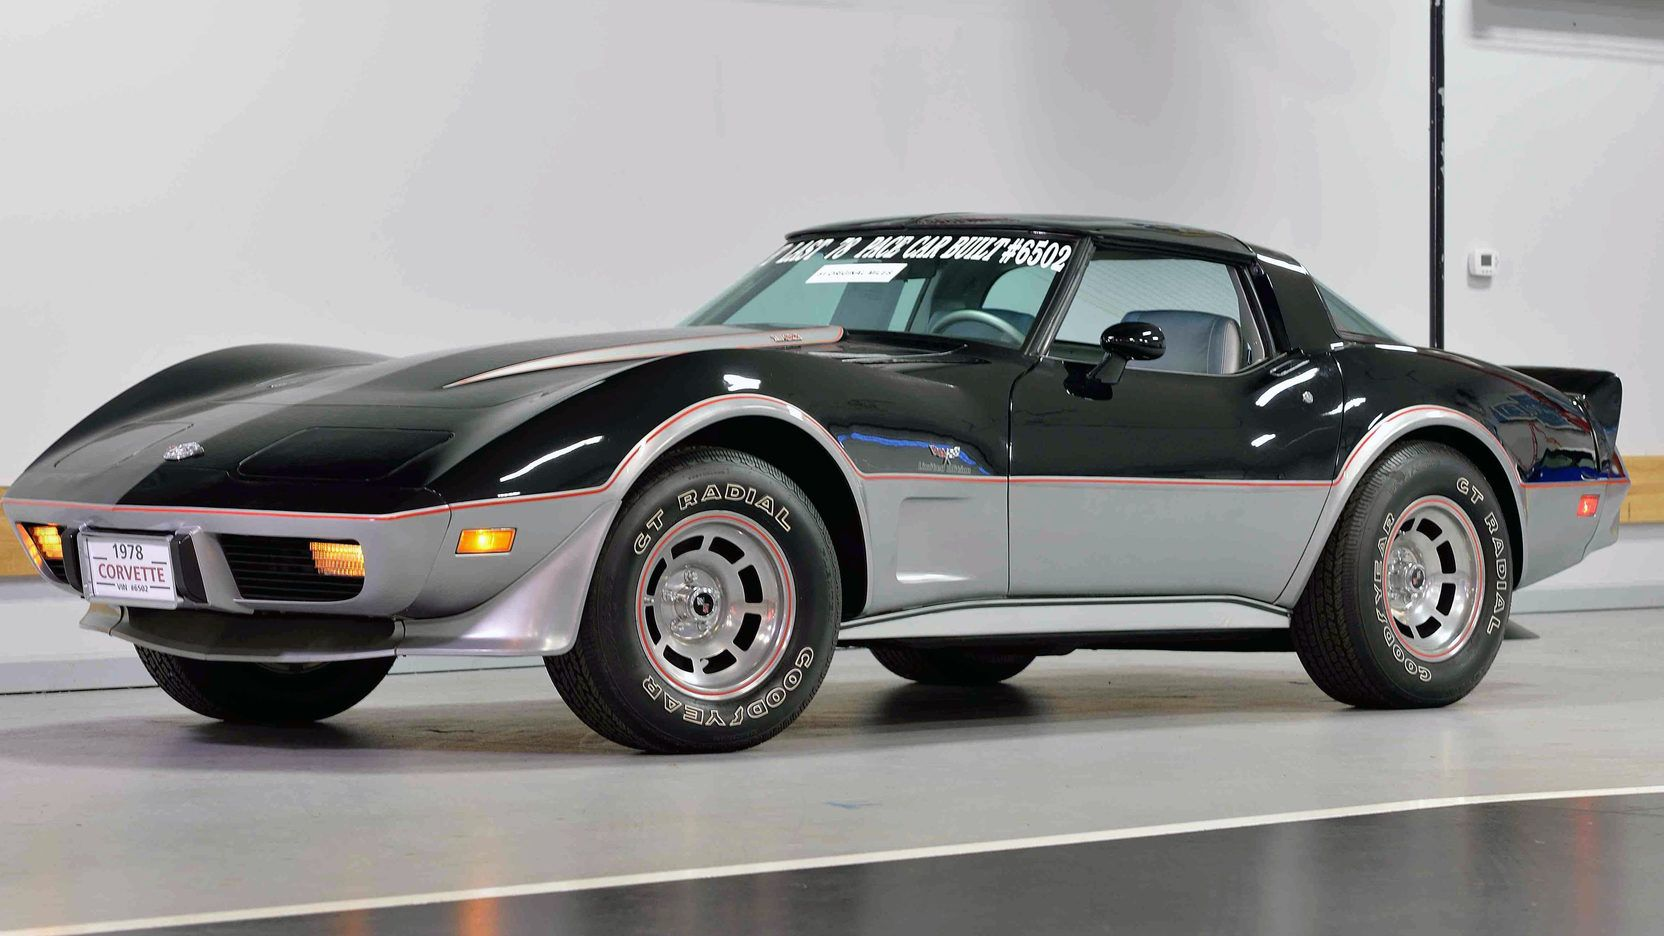 1978 chevrolet corvette indy 500 pace car indianapolis 500 pace cars pinterest chevrolet corvette chevrolet and cars